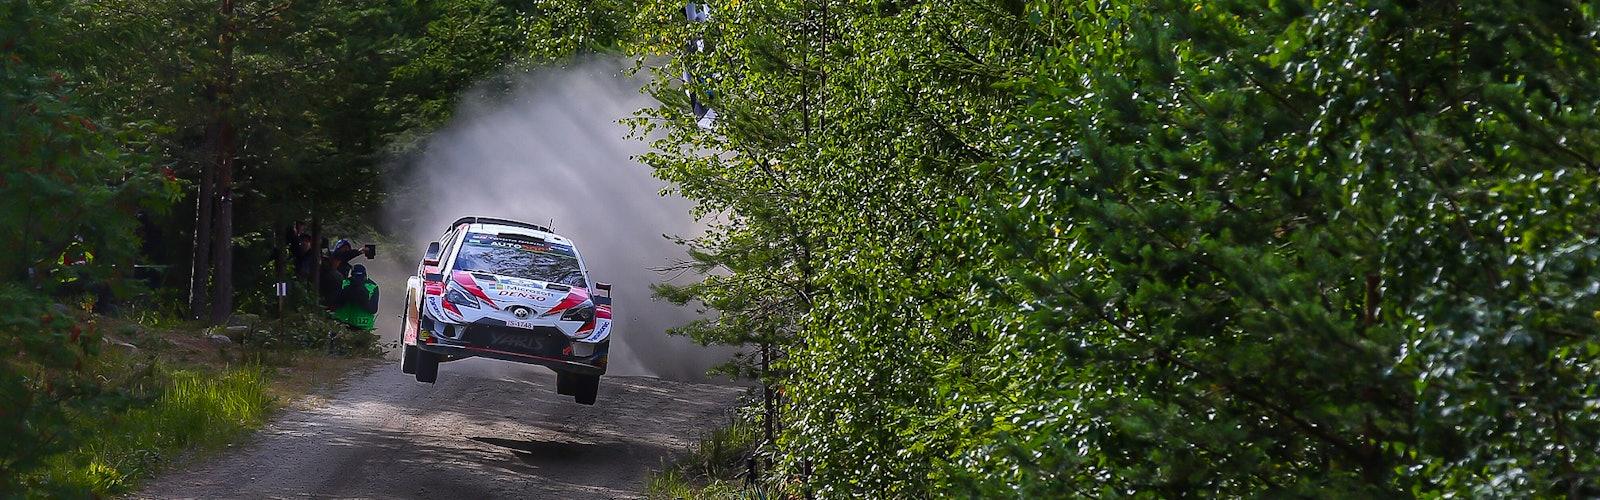 WRC_2019_Rd9_175